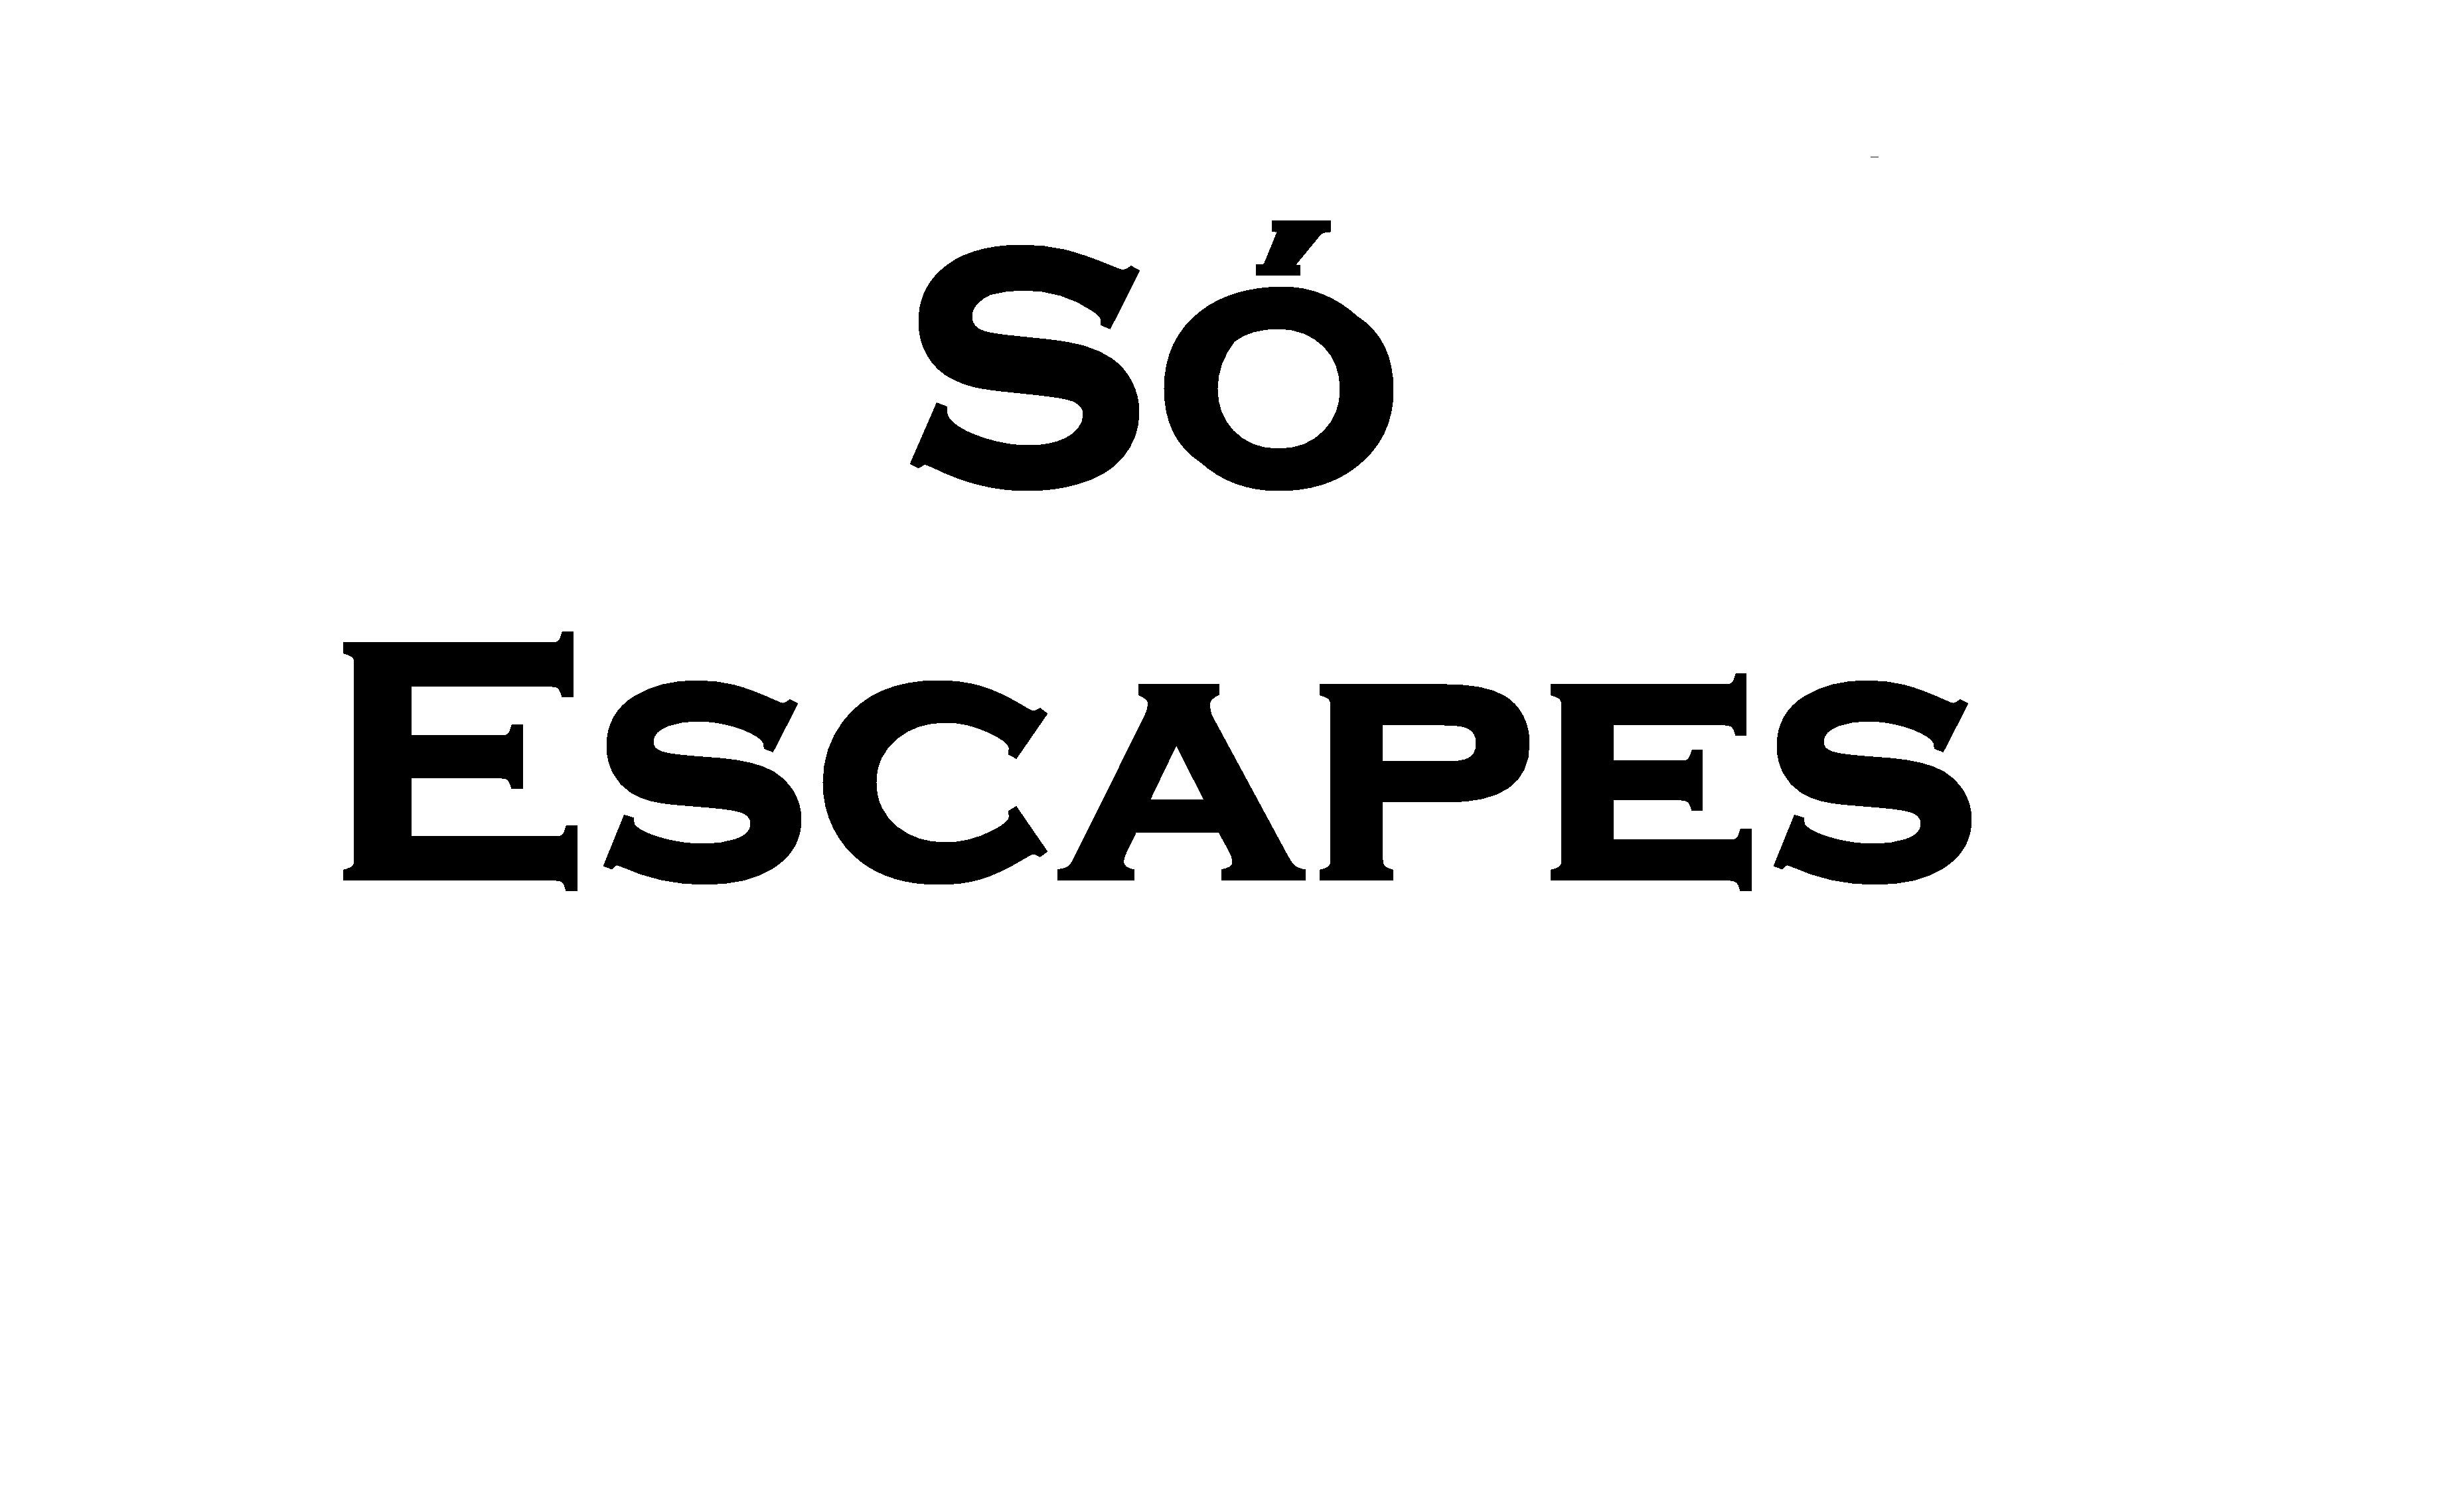 So escapes